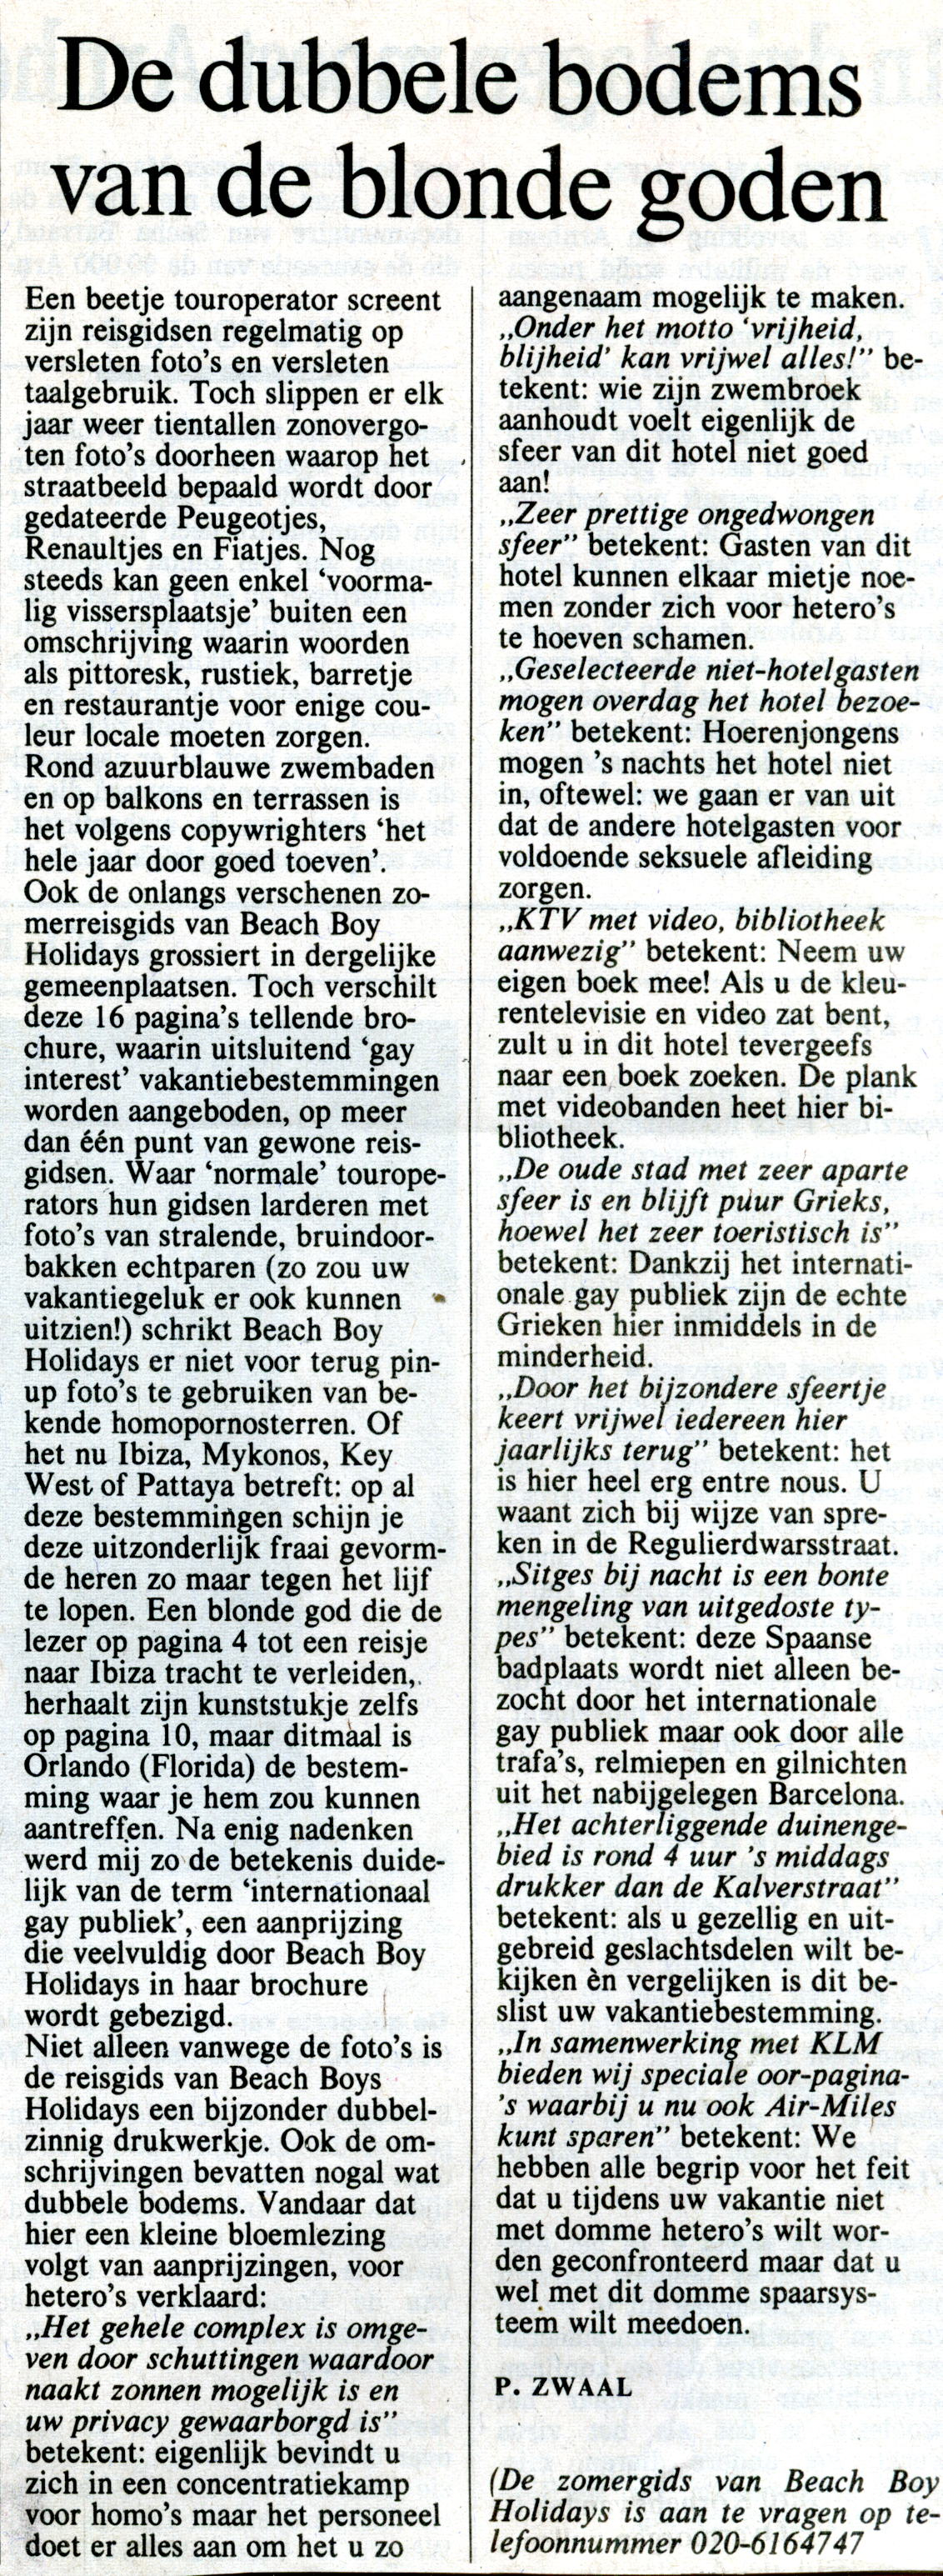 Gay krant nrc